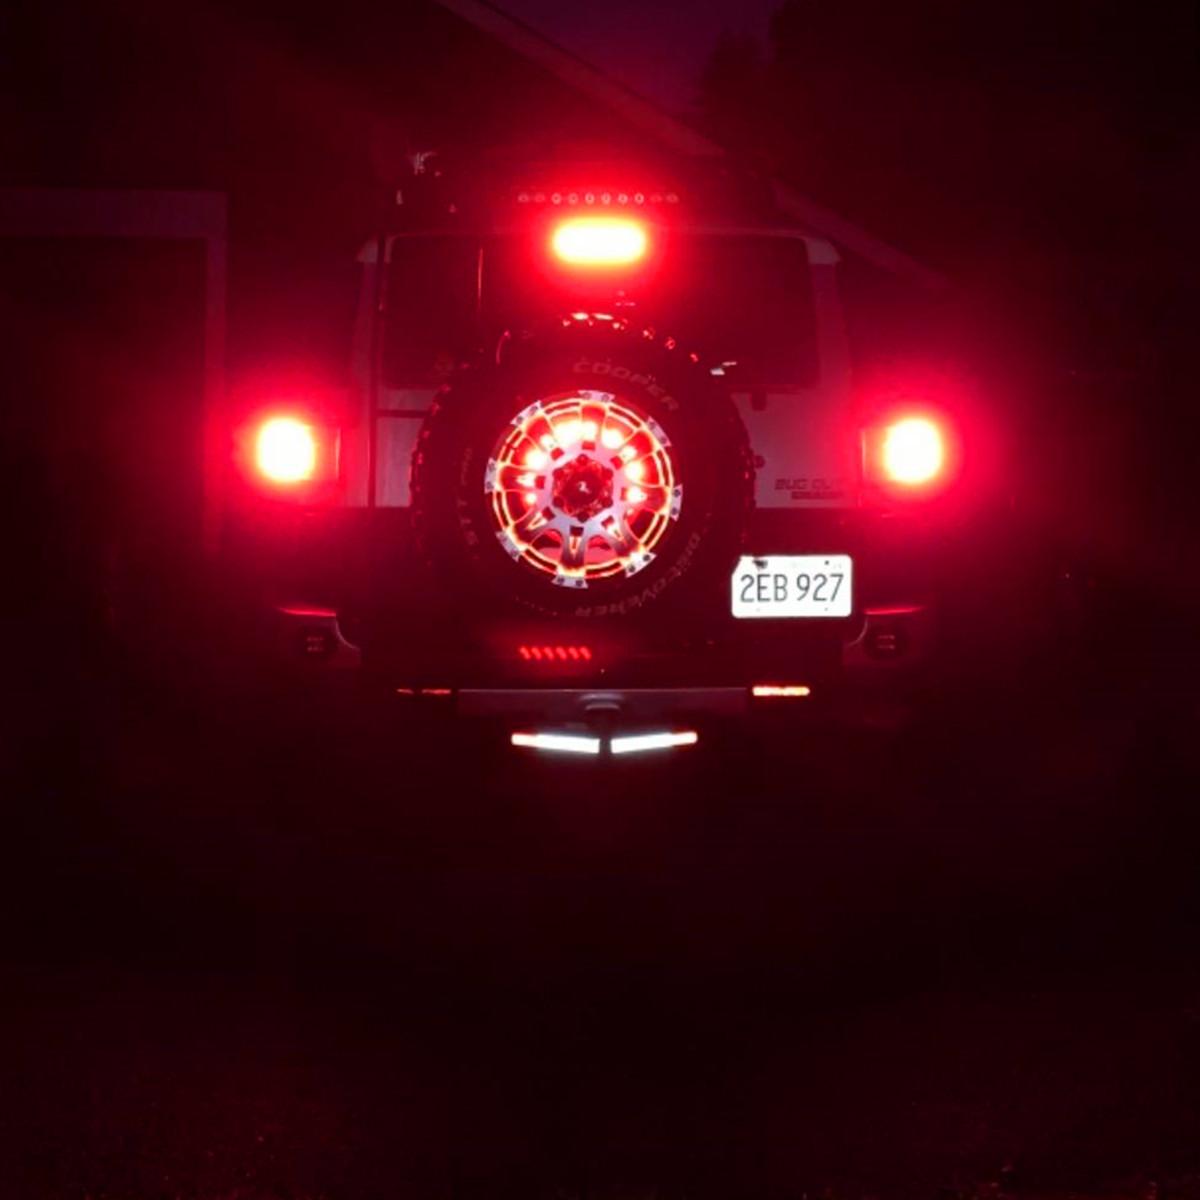 7440-7443-LED-Red-Brake-Tail-Lights-Bulbs-7443LL-7440LL-Signal-Lamp